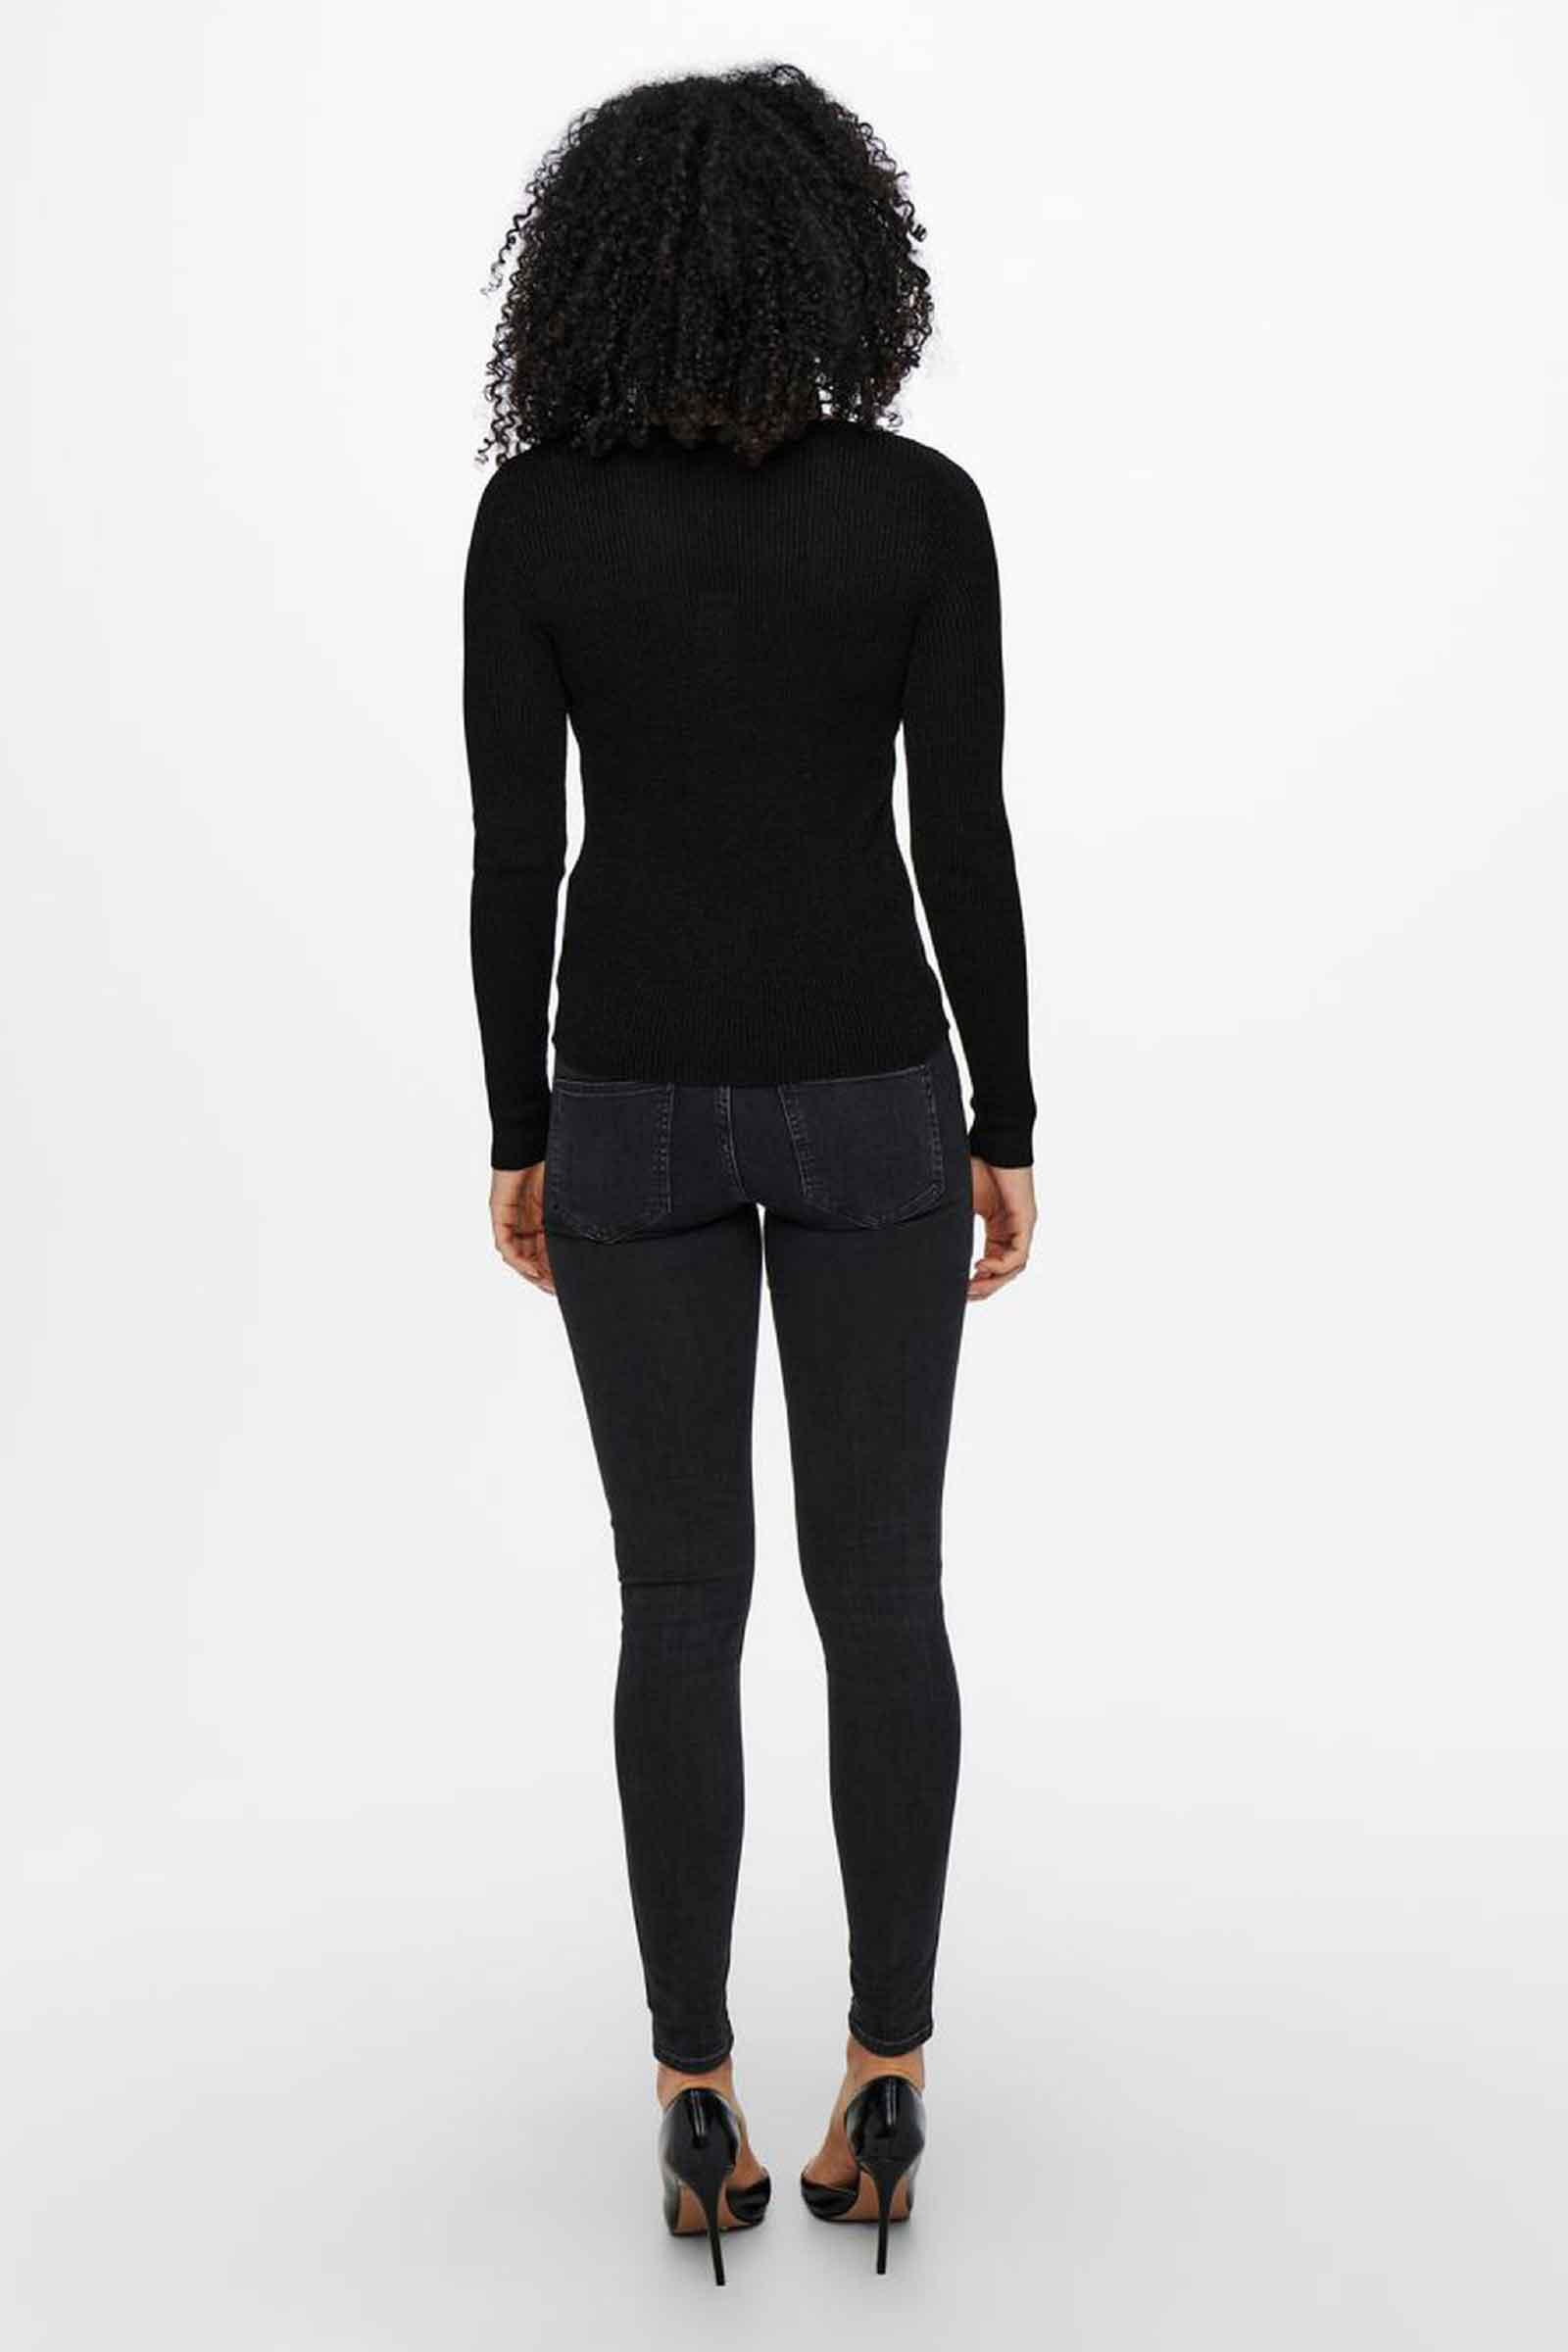 Sweater Woman Model MAGGI ONLY   Mesh   15231256Detail-W. DTM GLITTER